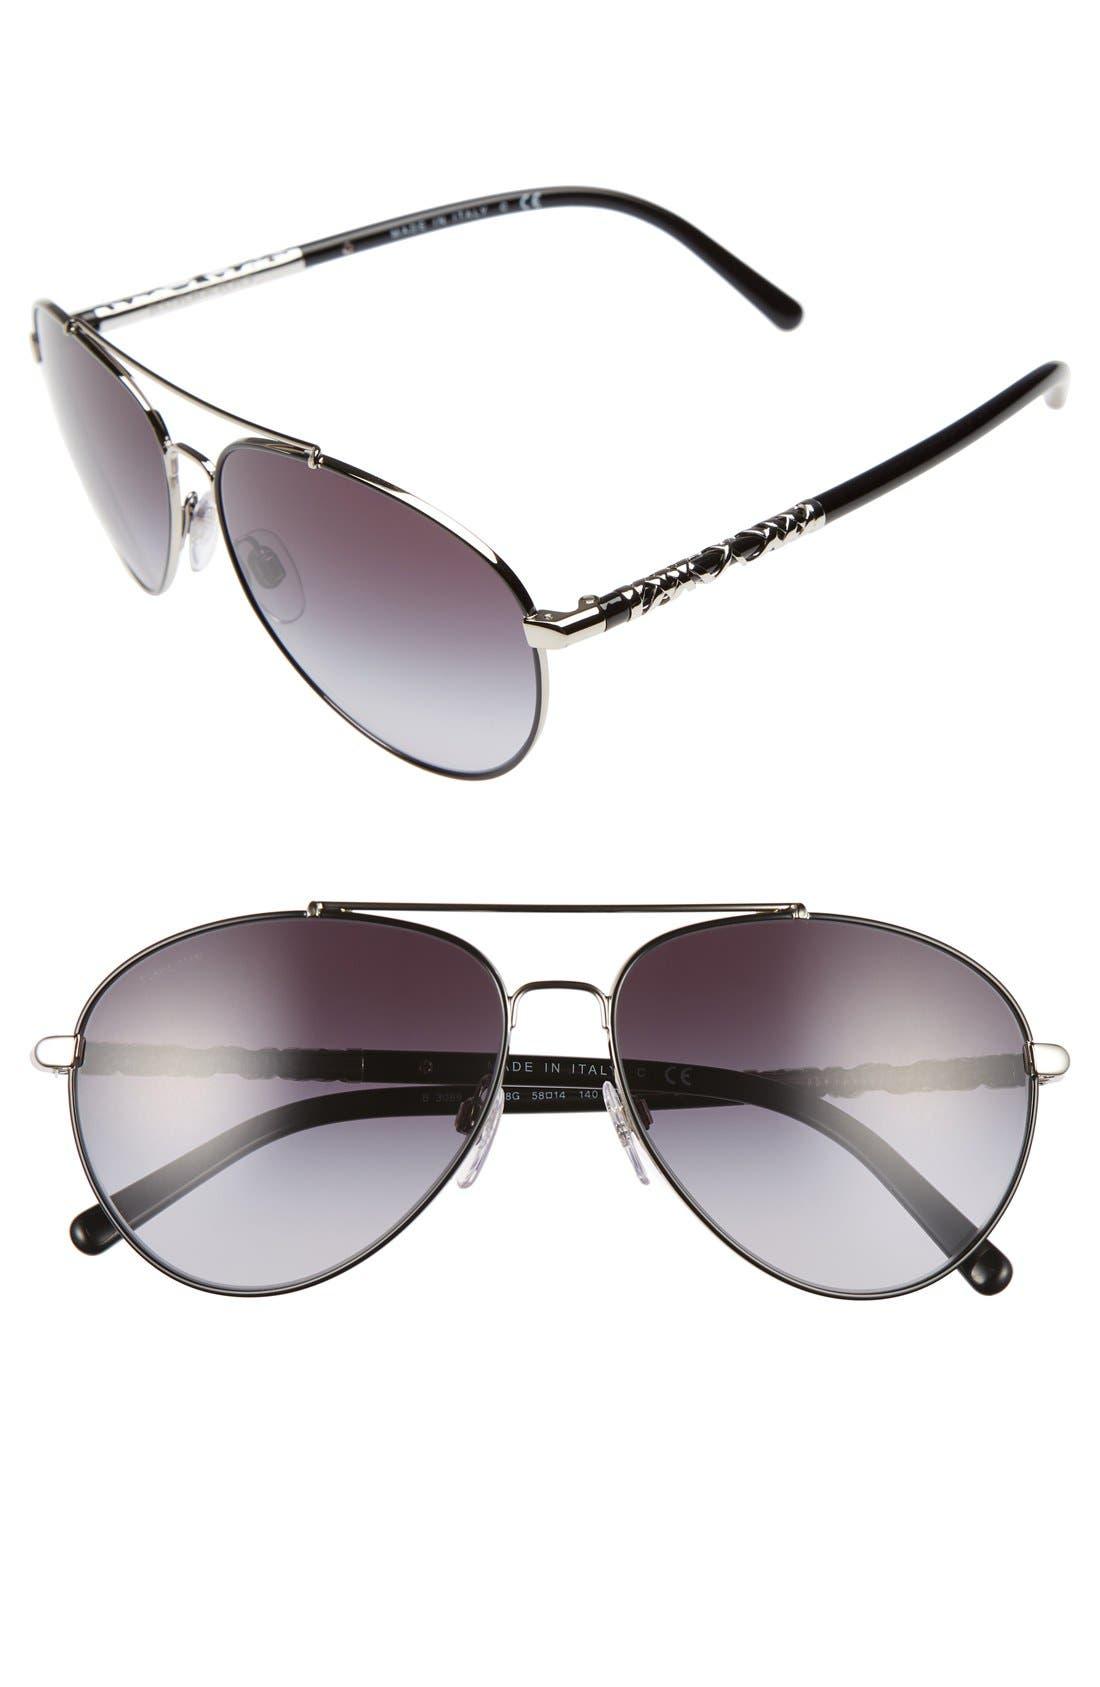 58mm Aviator Sunglasses,                             Main thumbnail 1, color,                             020